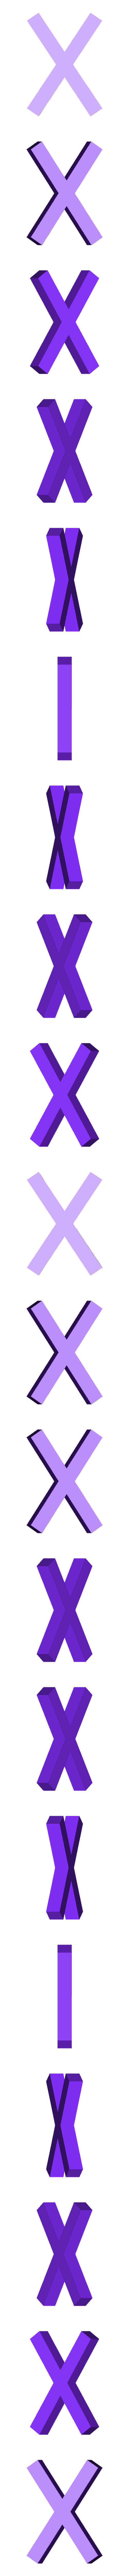 WakandaFont-I.stl Download free STL file Wakandan Font • Model to 3D print, hterefenko